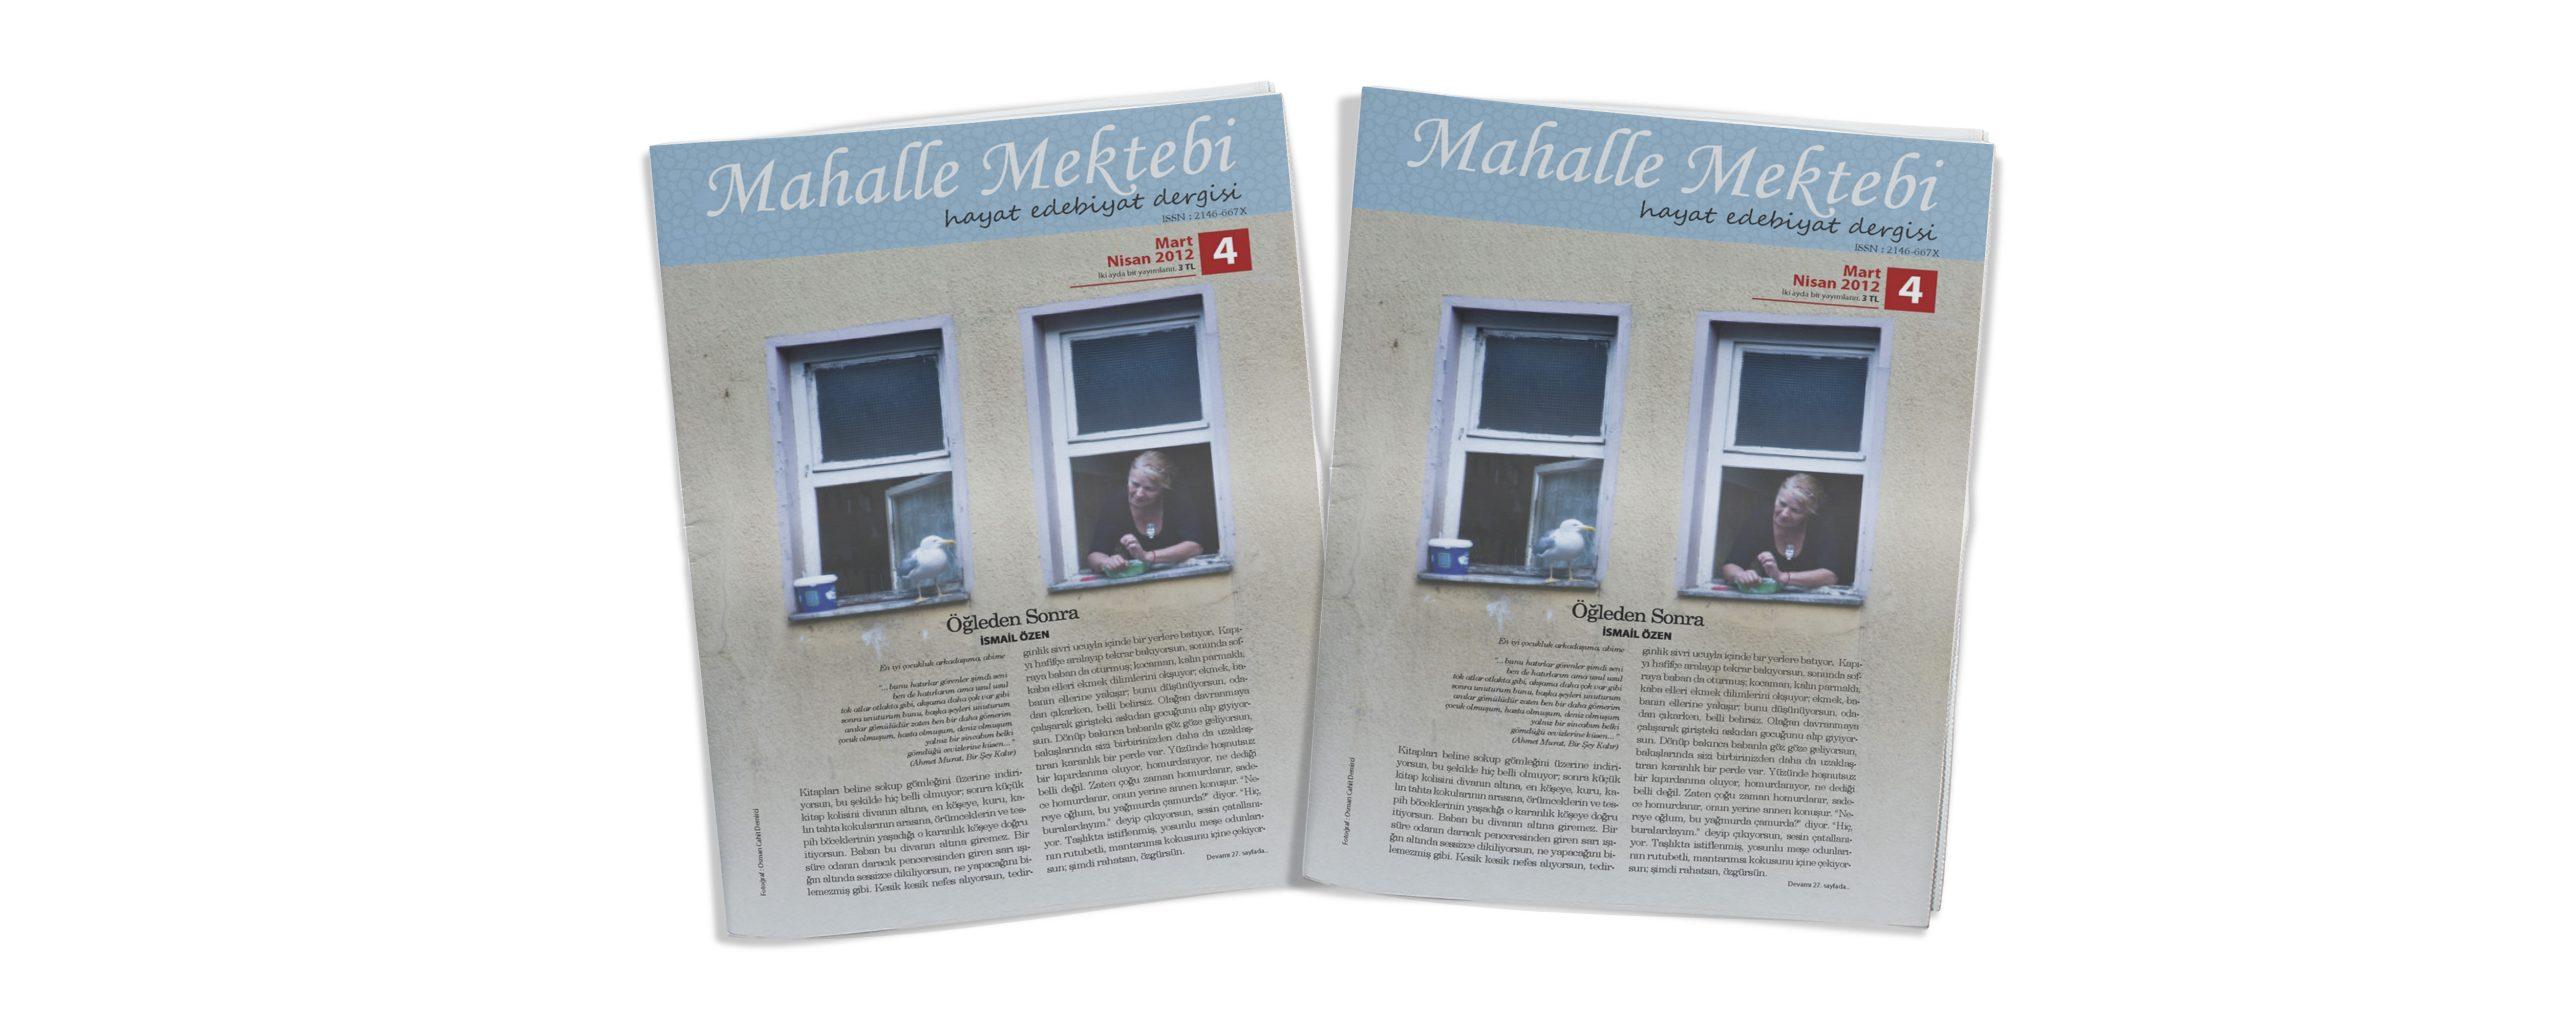 Mahalle Mektebi 4 (Mart-Nisan 2012)